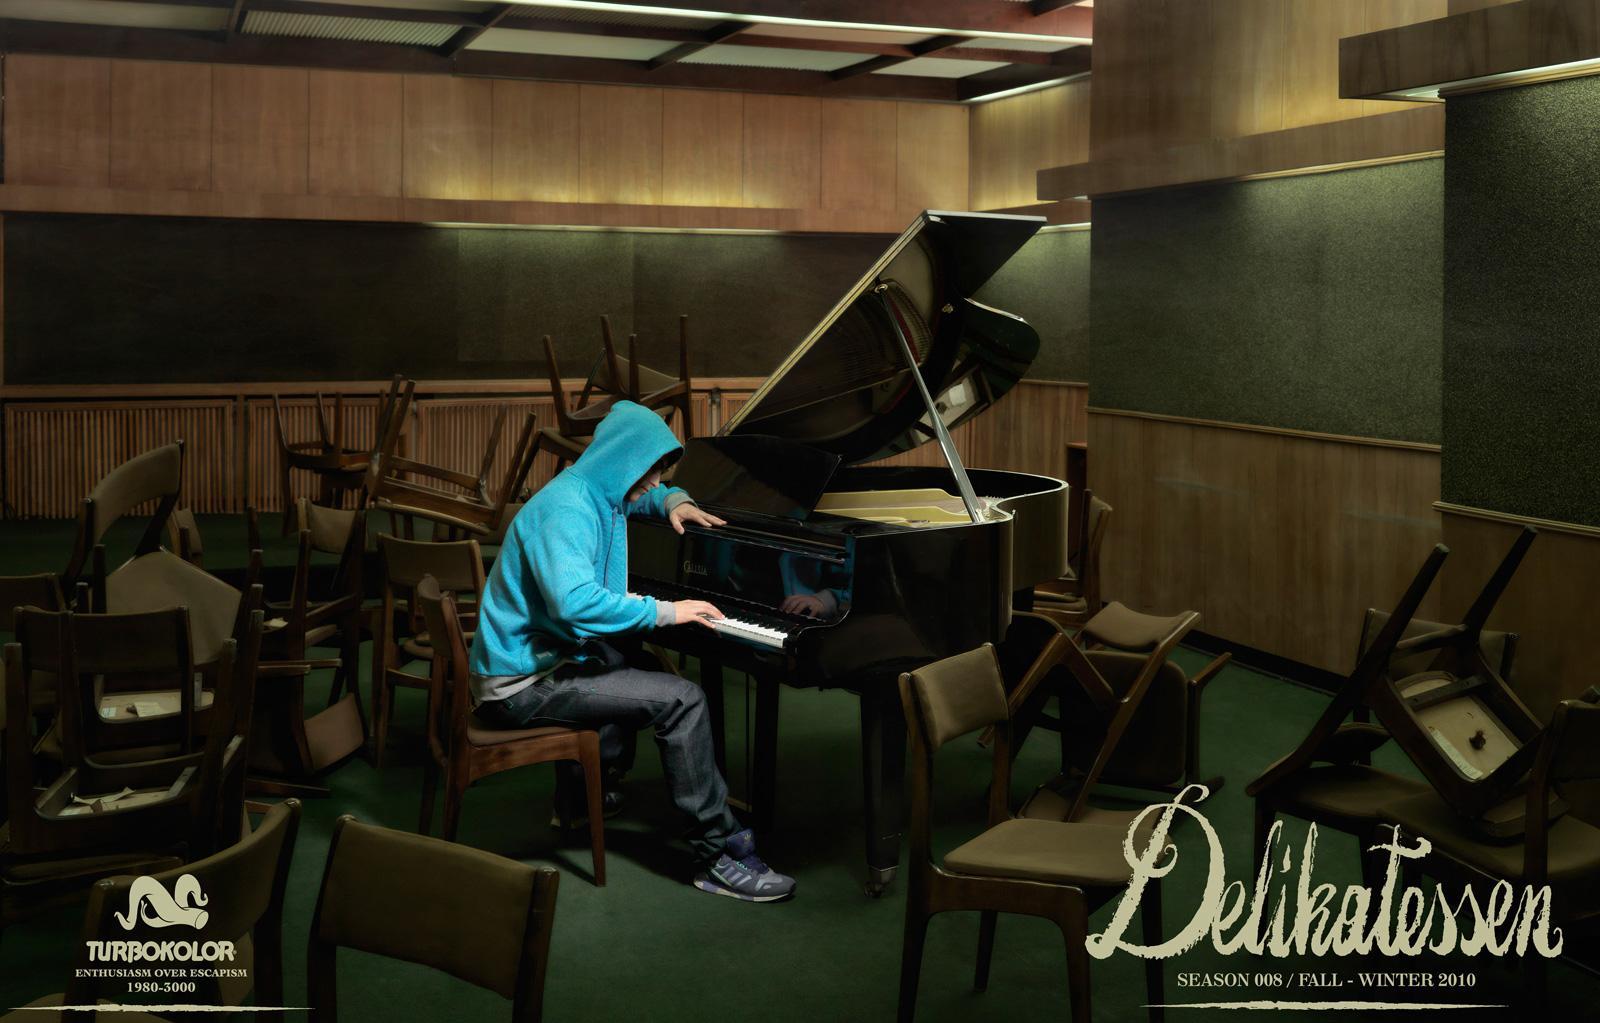 Turbokolor Print Ad -  Delikatessen, Piano